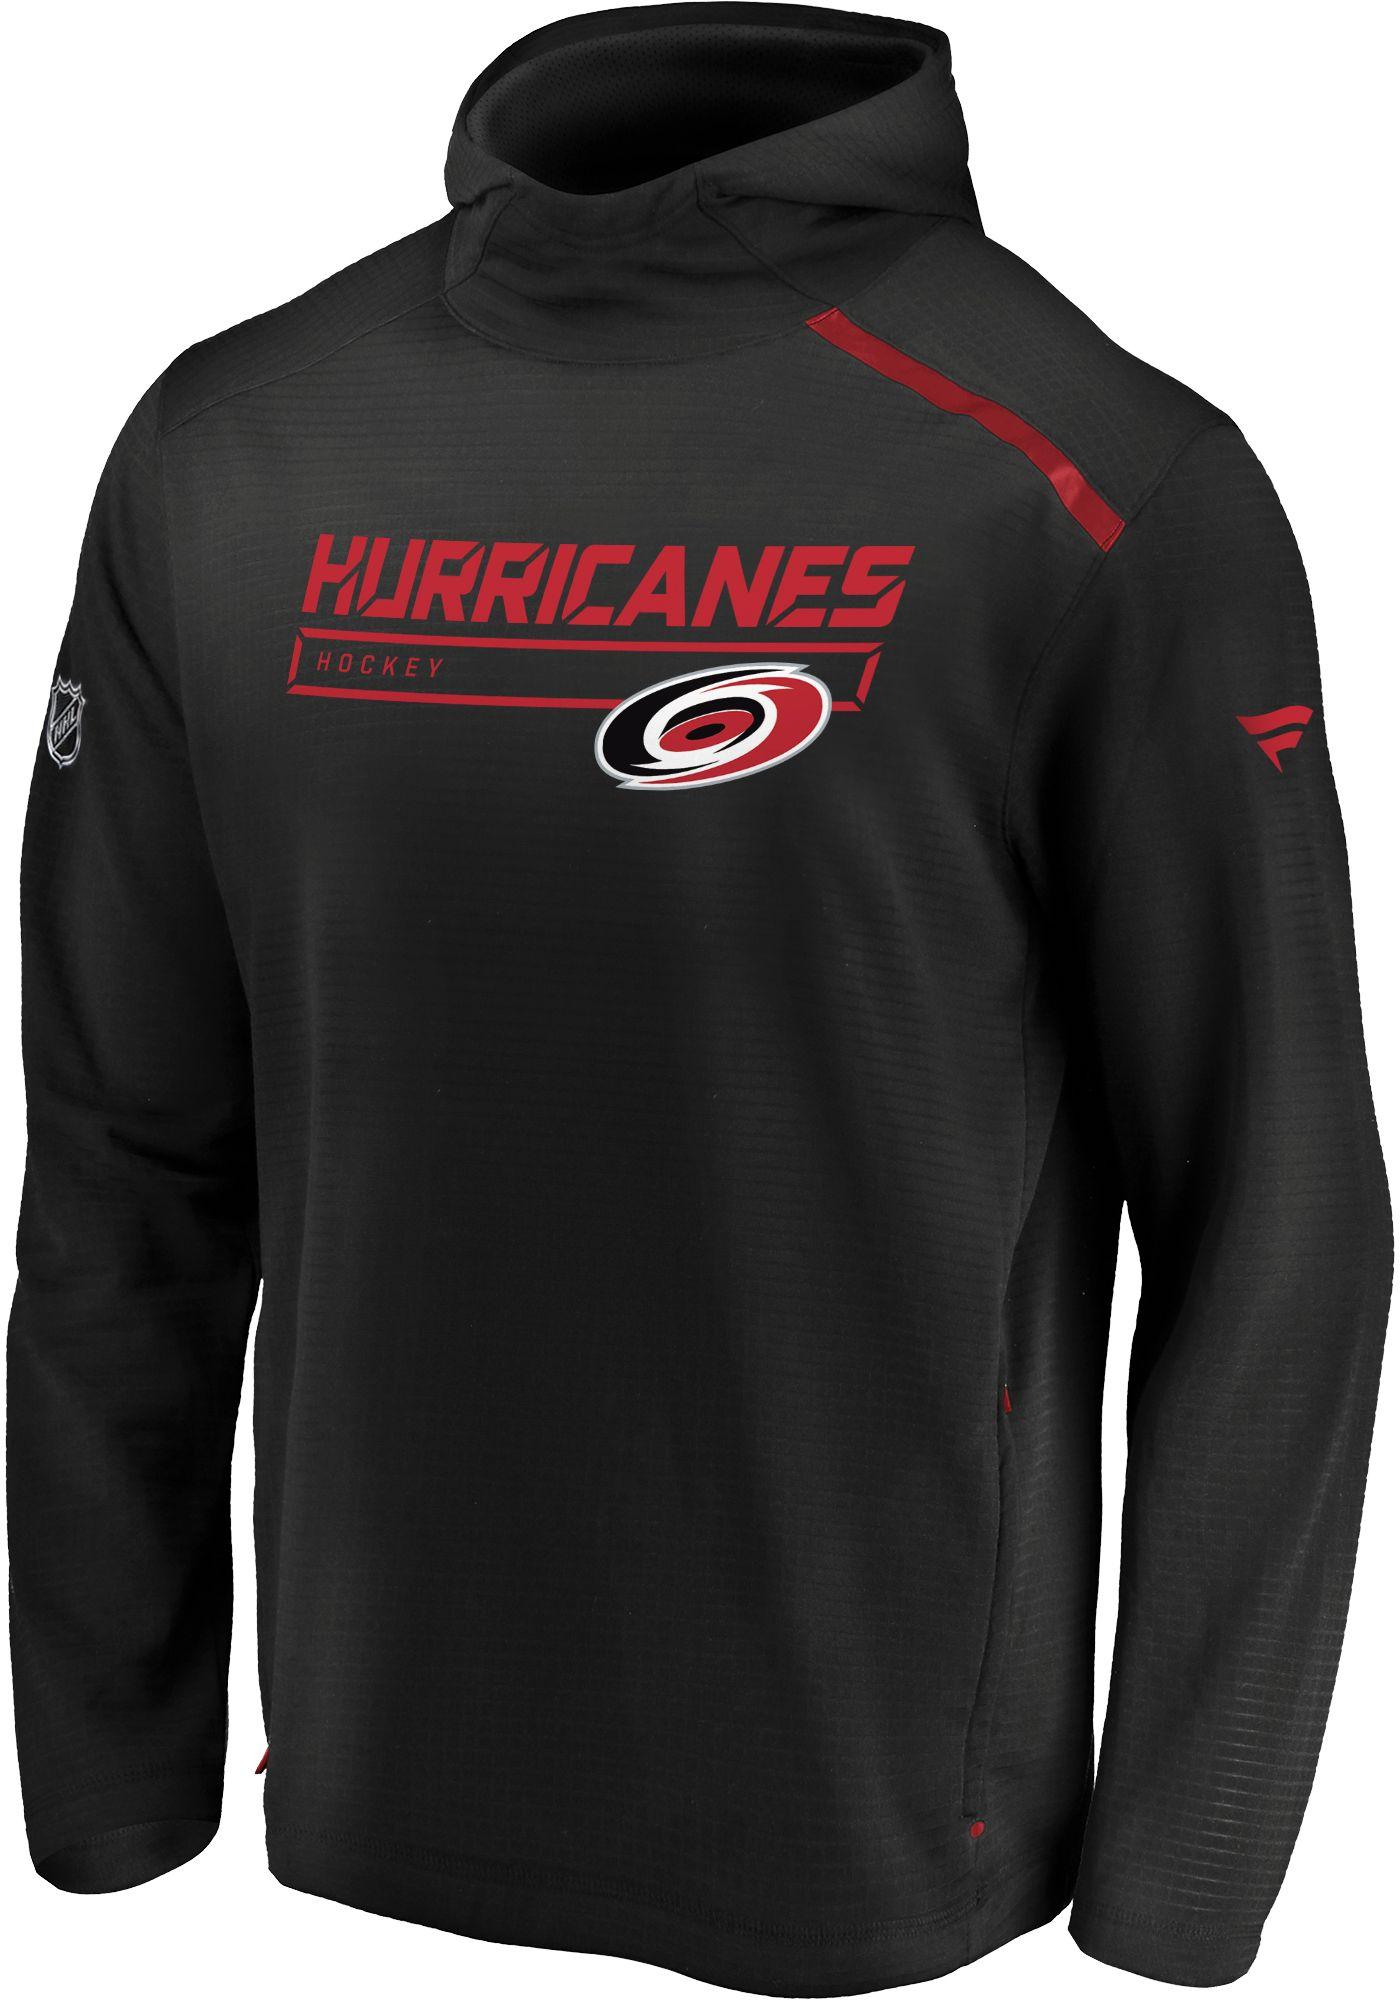 NHL Men's Carolina Hurricanes Authentic Pro Tansitional Black Hoodie